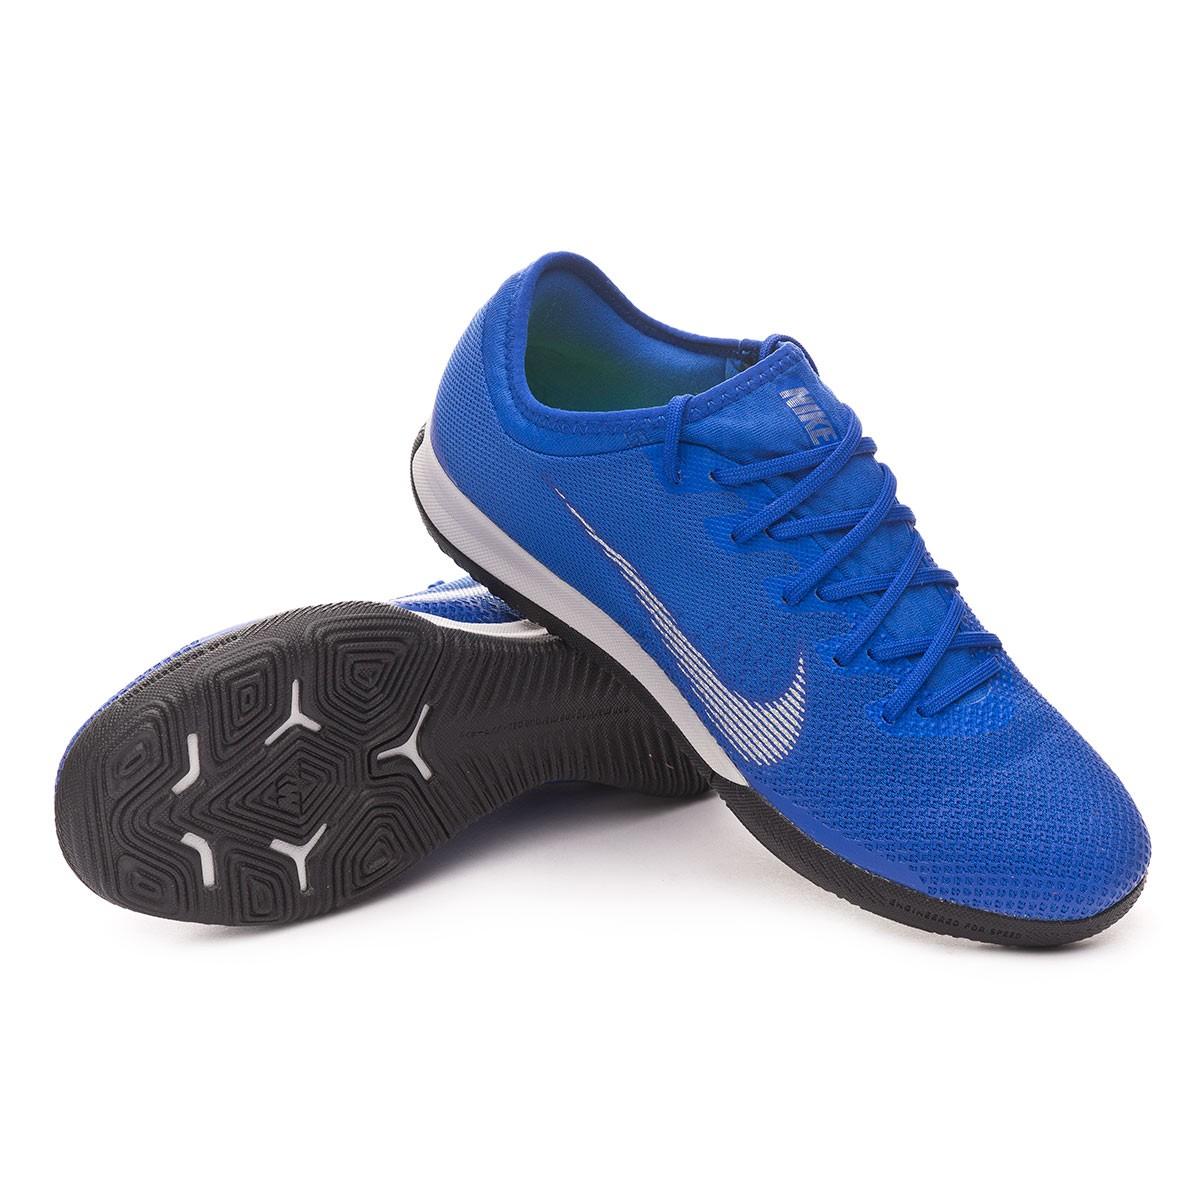 63db006fe Futsal Boot Nike Mercurial VaporX XII Pro IC Racer blue-Matallic ...